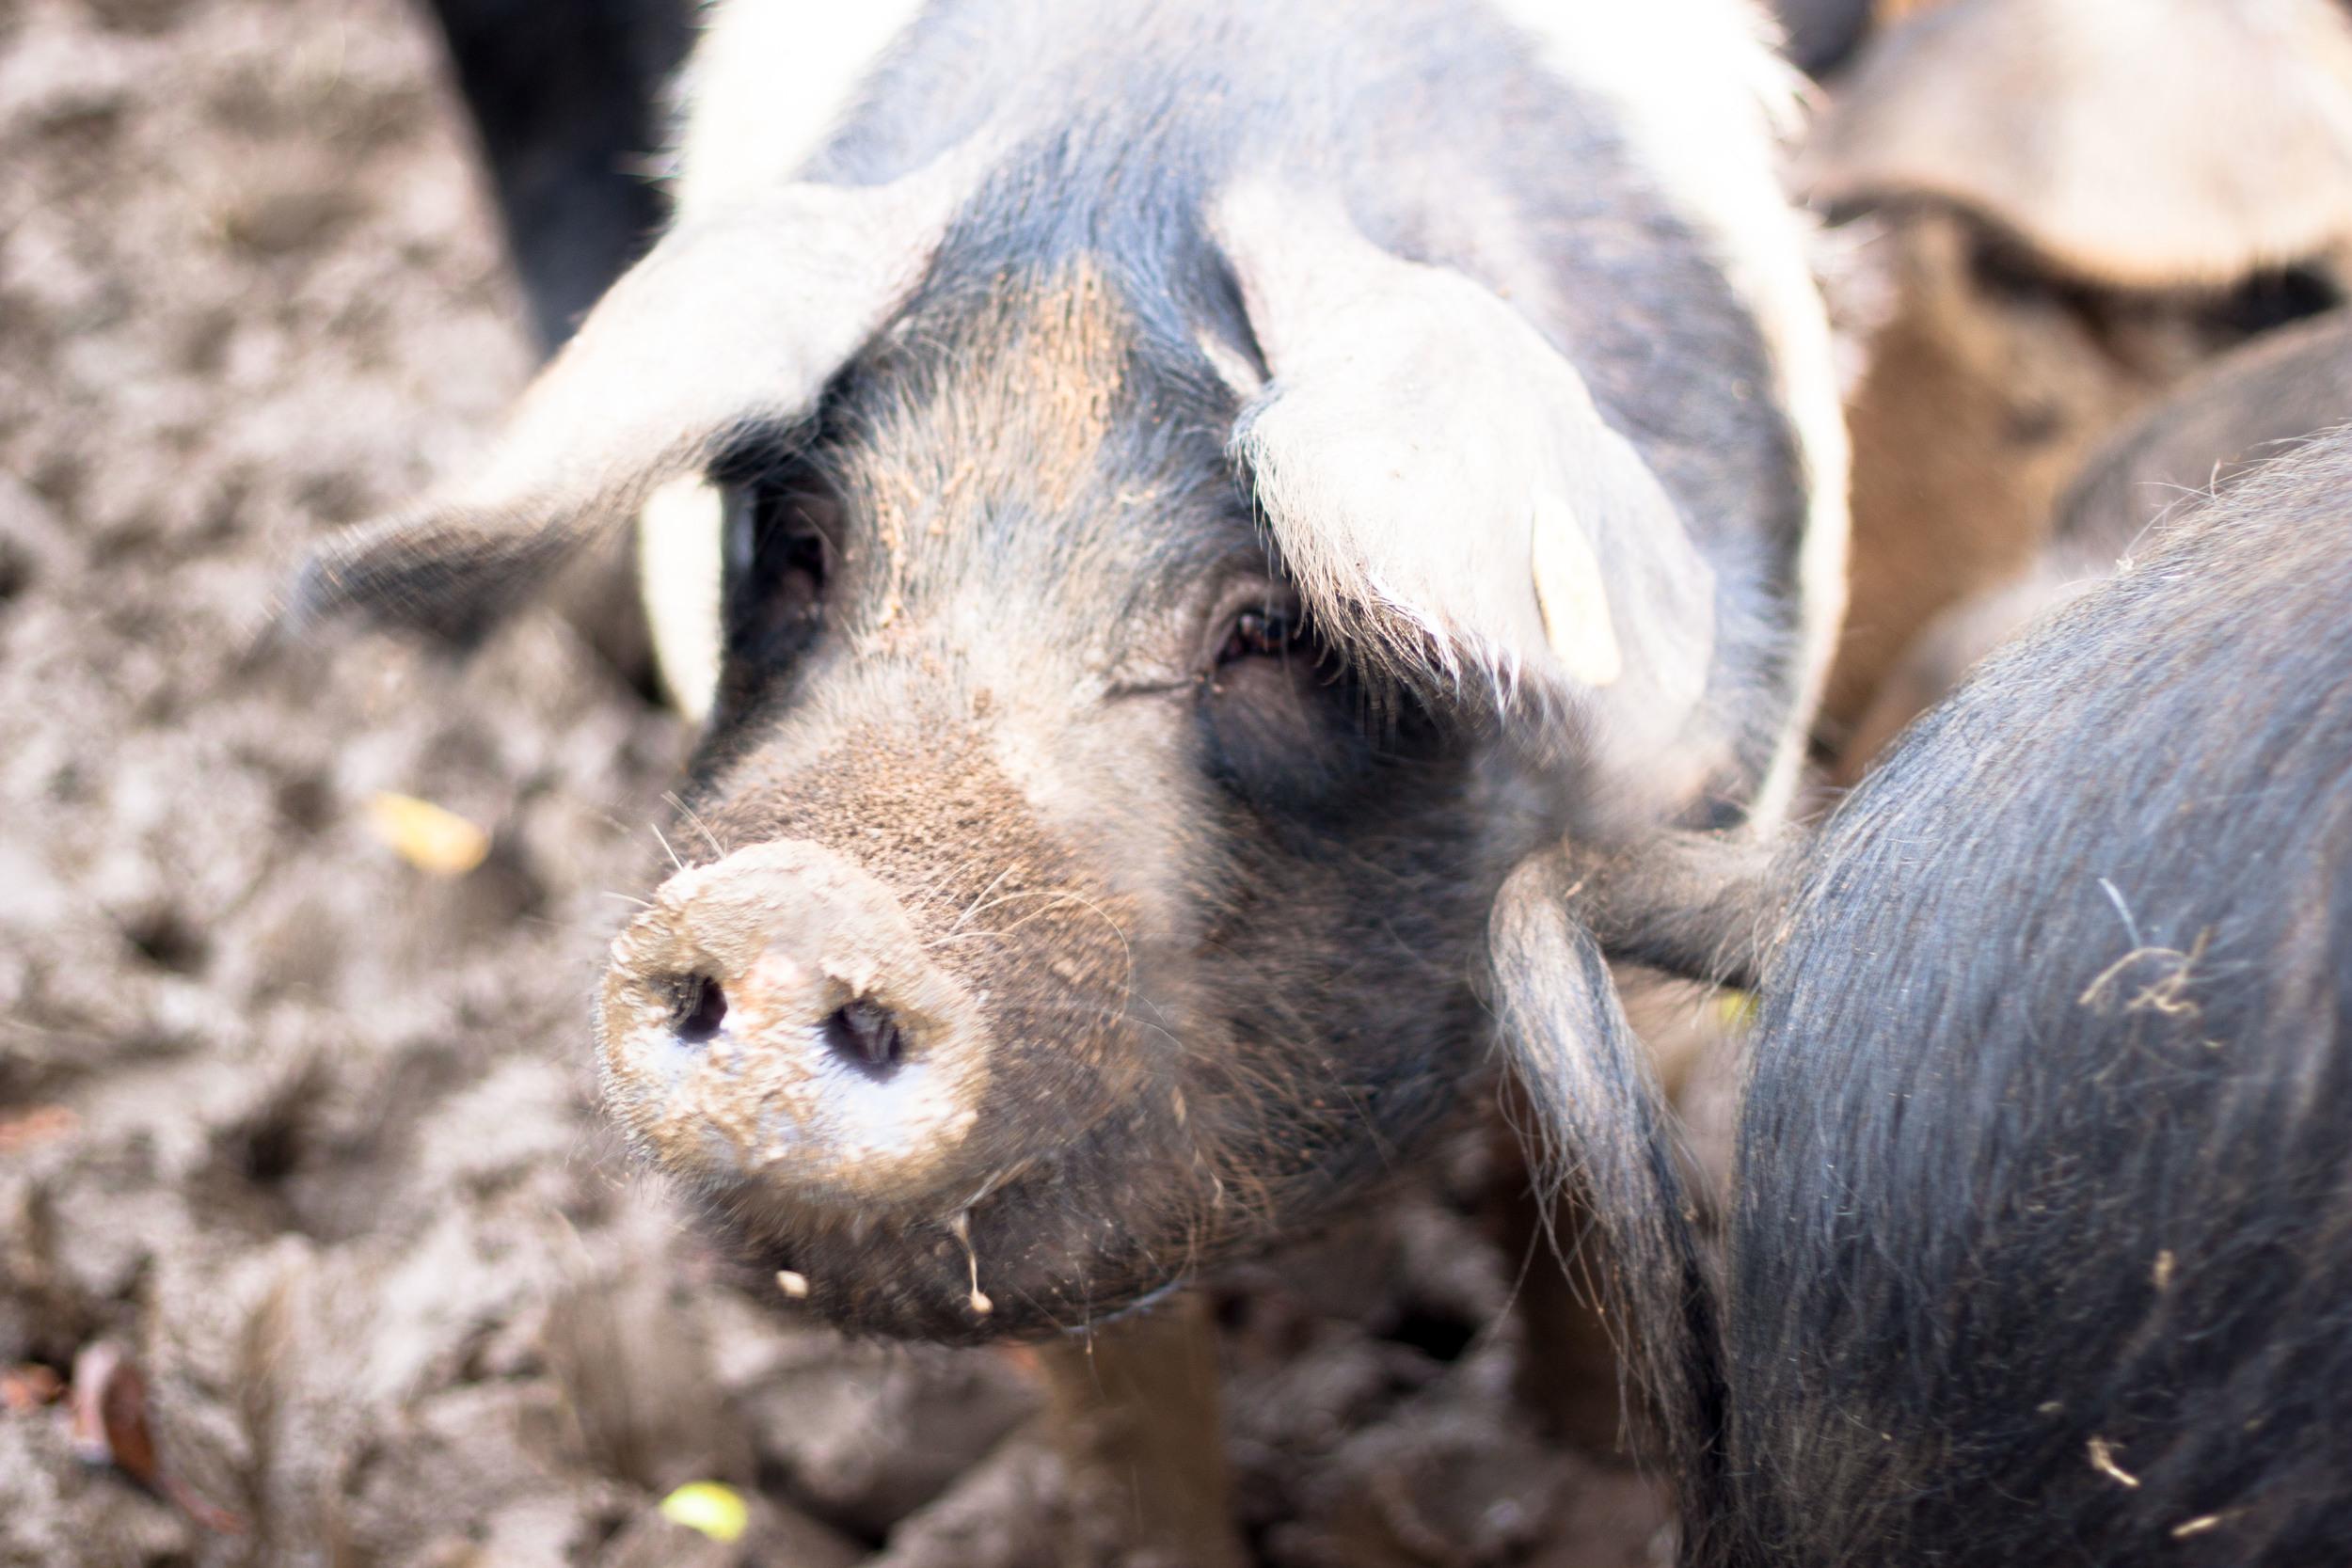 sandridge_farmhouse_pig_close